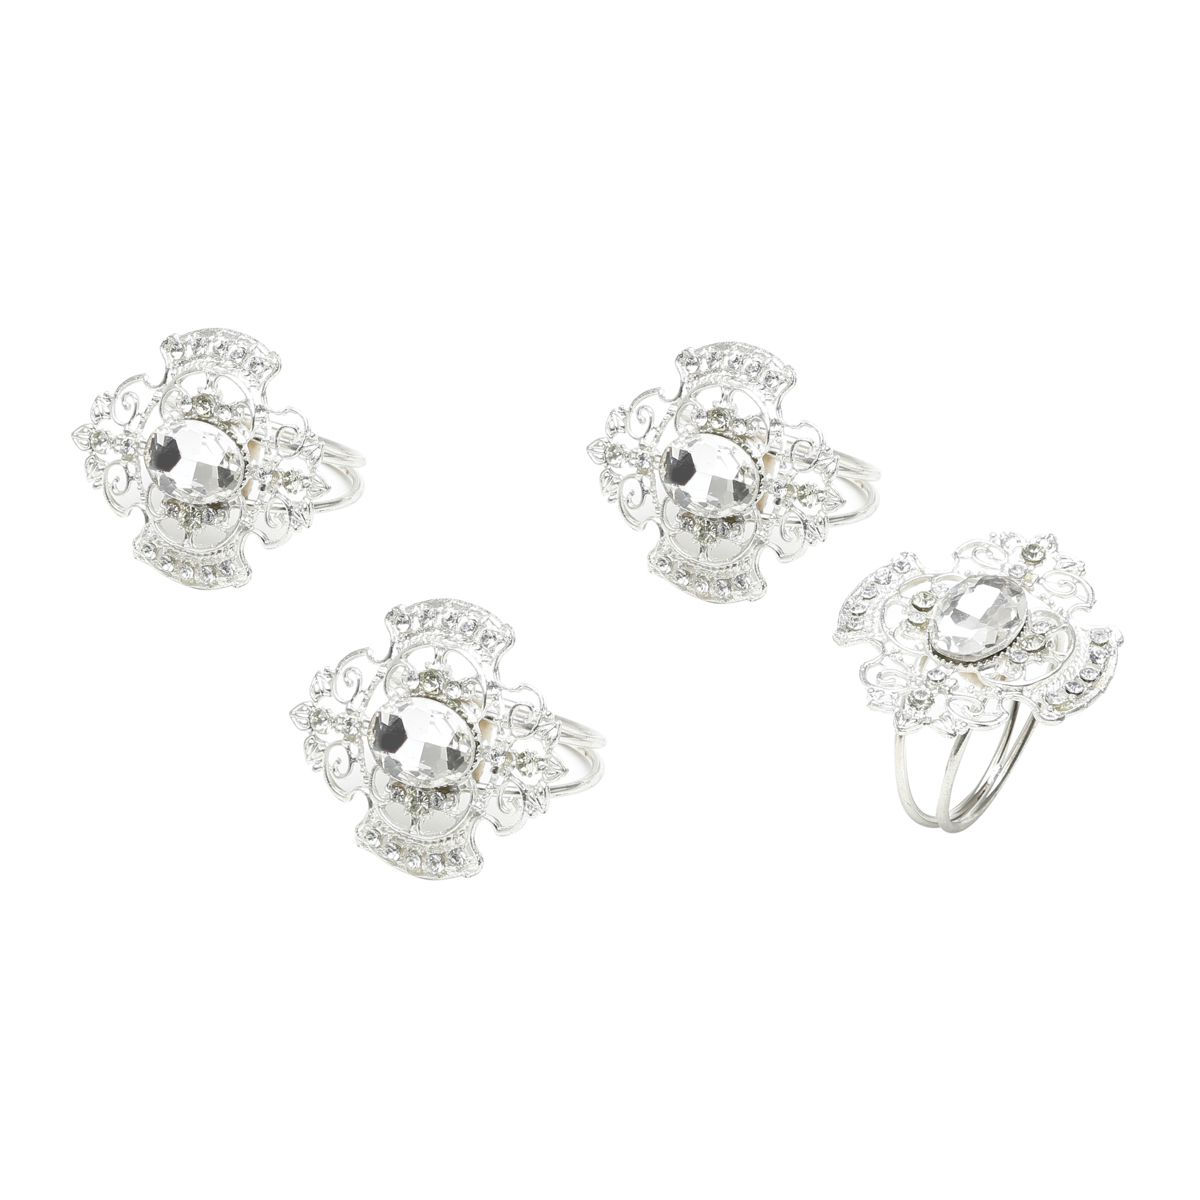 Jogo 4 anéis Para Guardanapo de Ferro Fundido Niquelado Oval Diamond